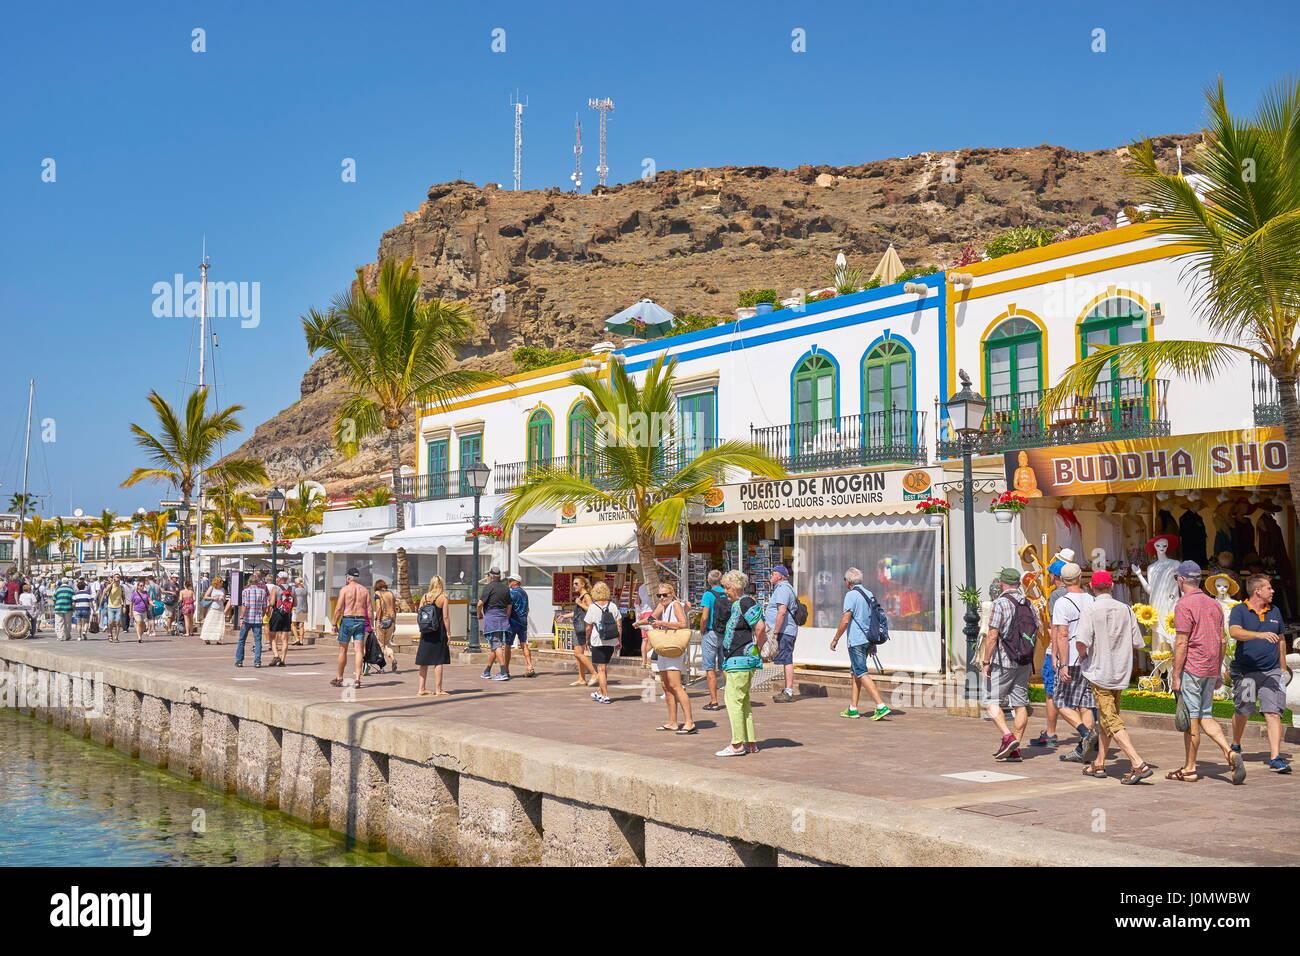 Kanarische Inseln, Gran Canaria, Puerto de Mogan, Spanien Stockbild